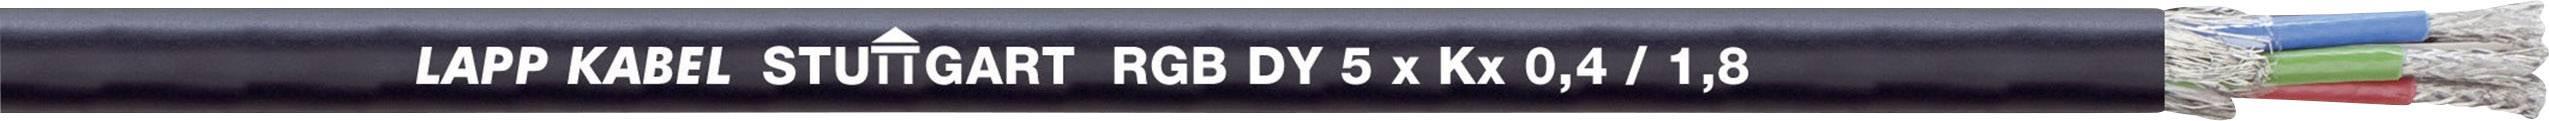 Koaxiální kabel LappKabel RGB DY (0034246), 1000 m